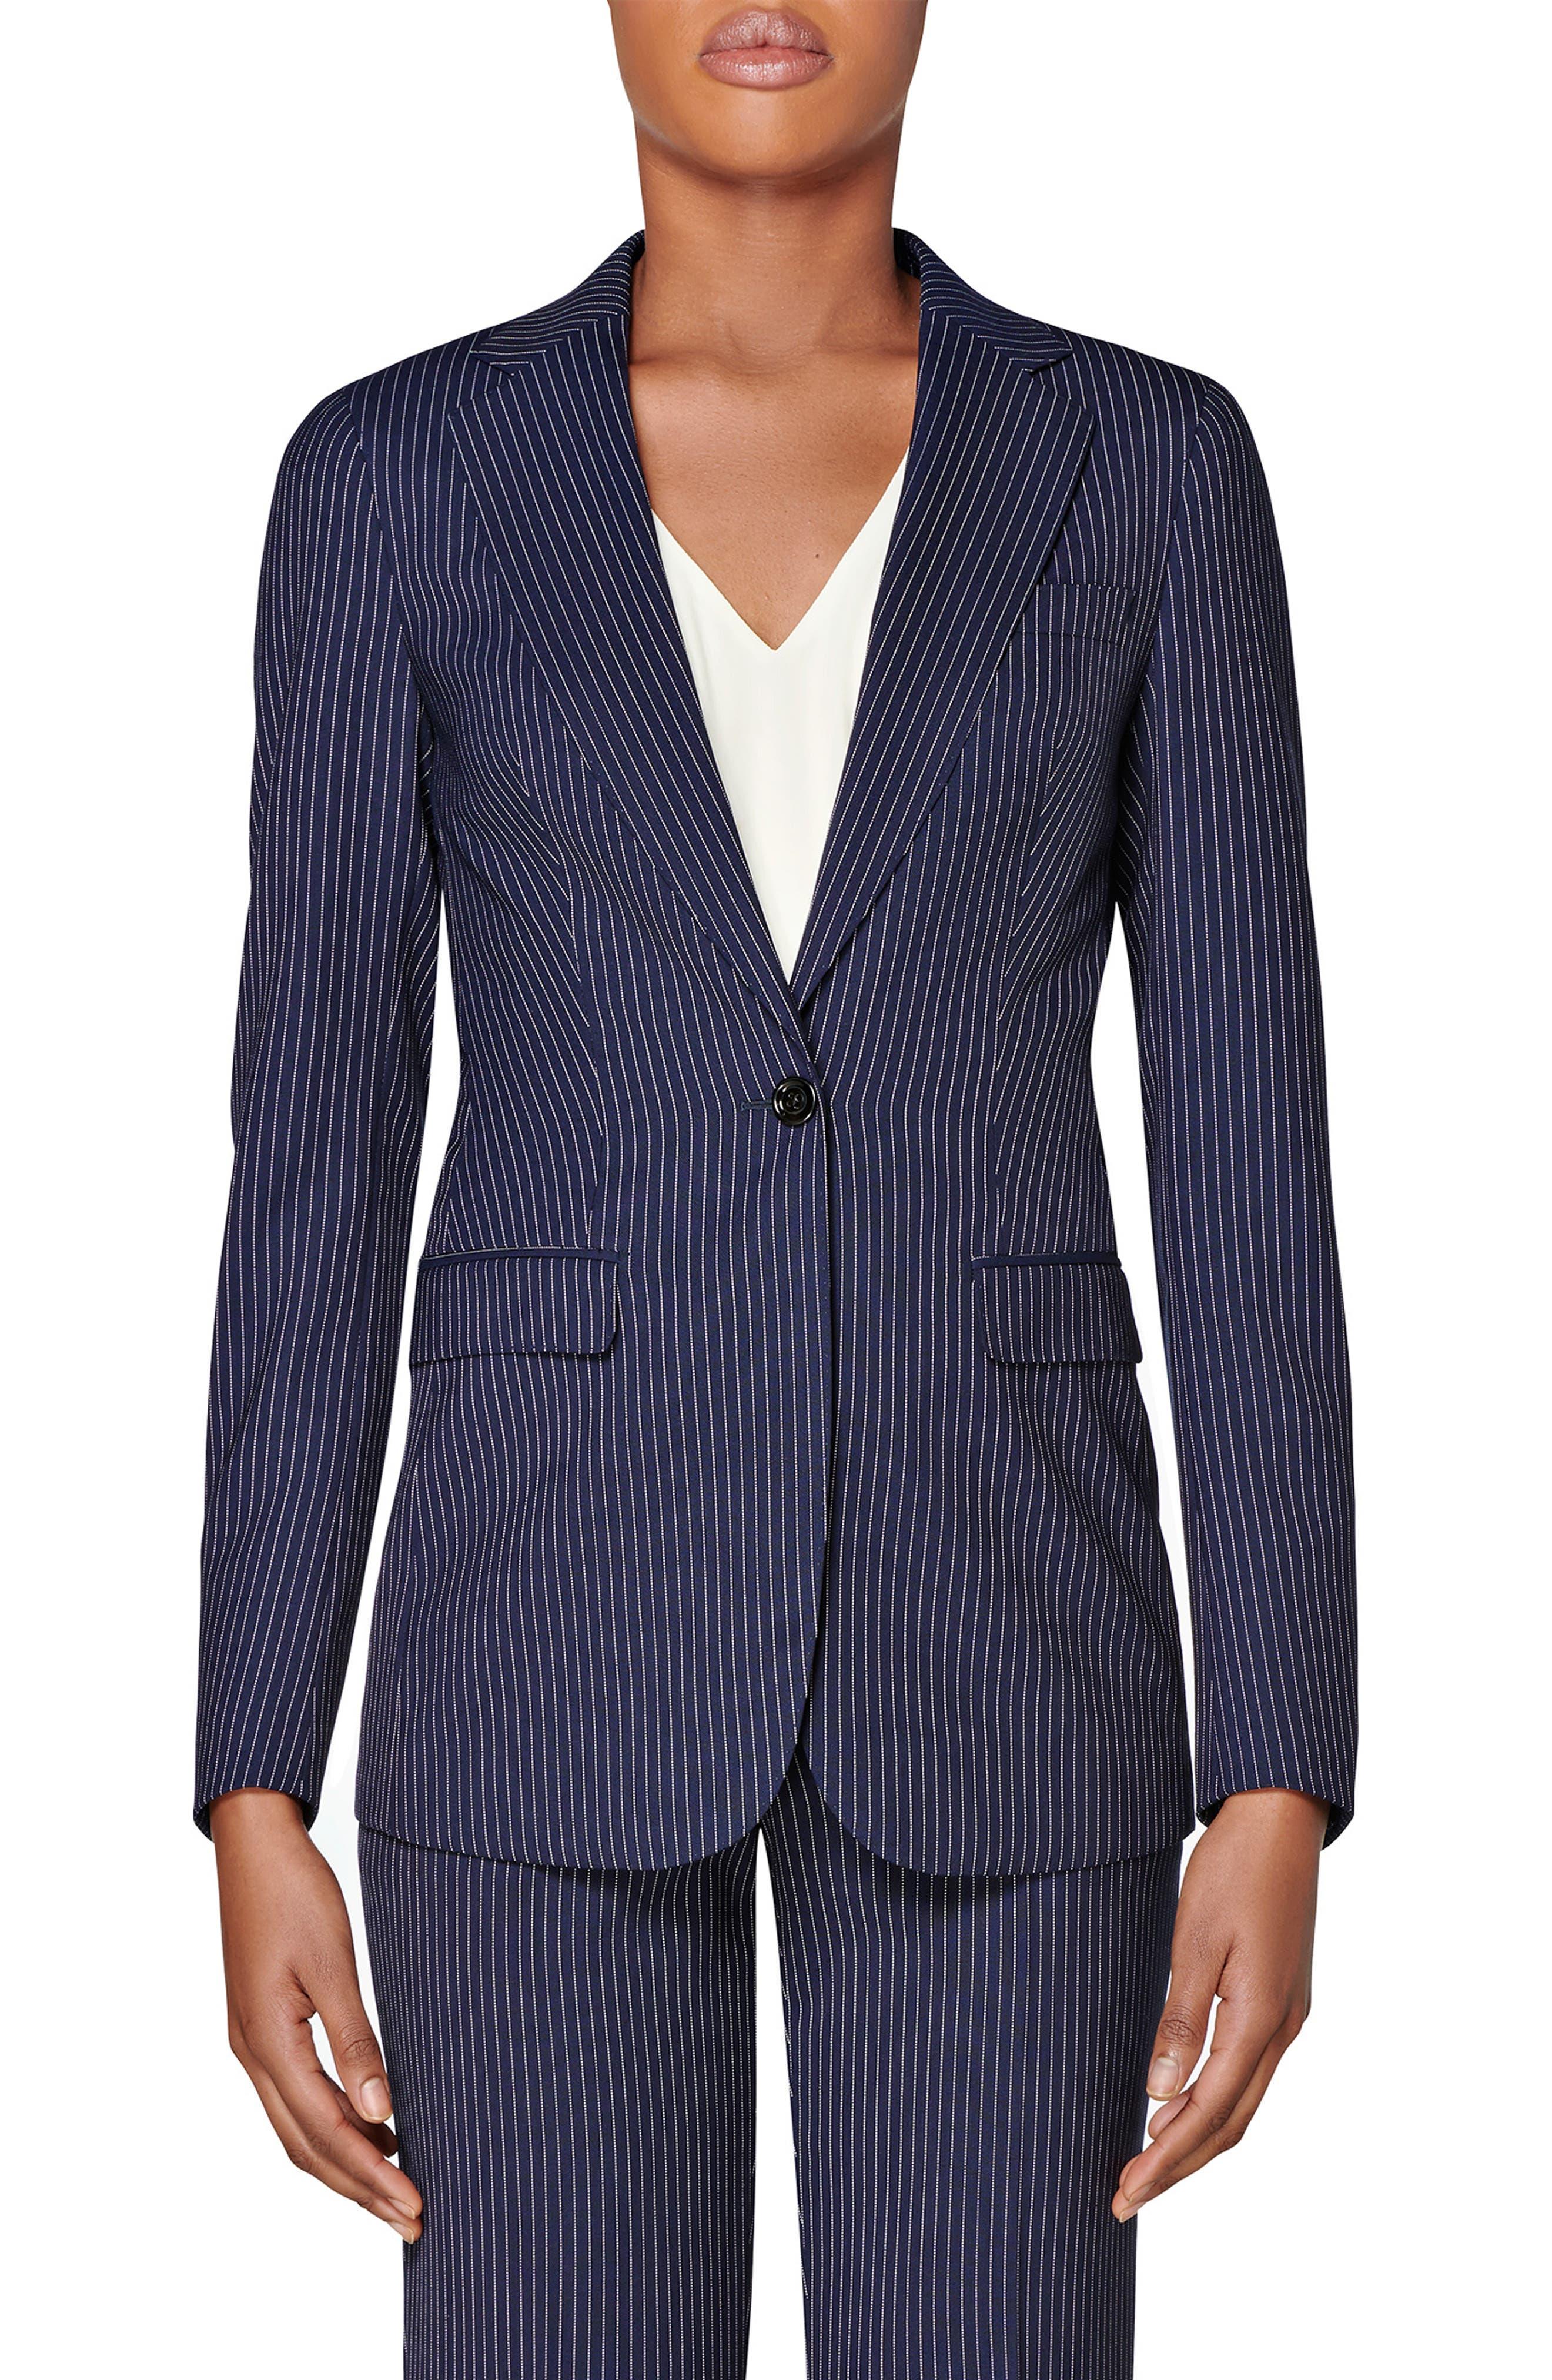 Image of SUISTUDIO Cameron Pinstripe Wool Suit Jacket